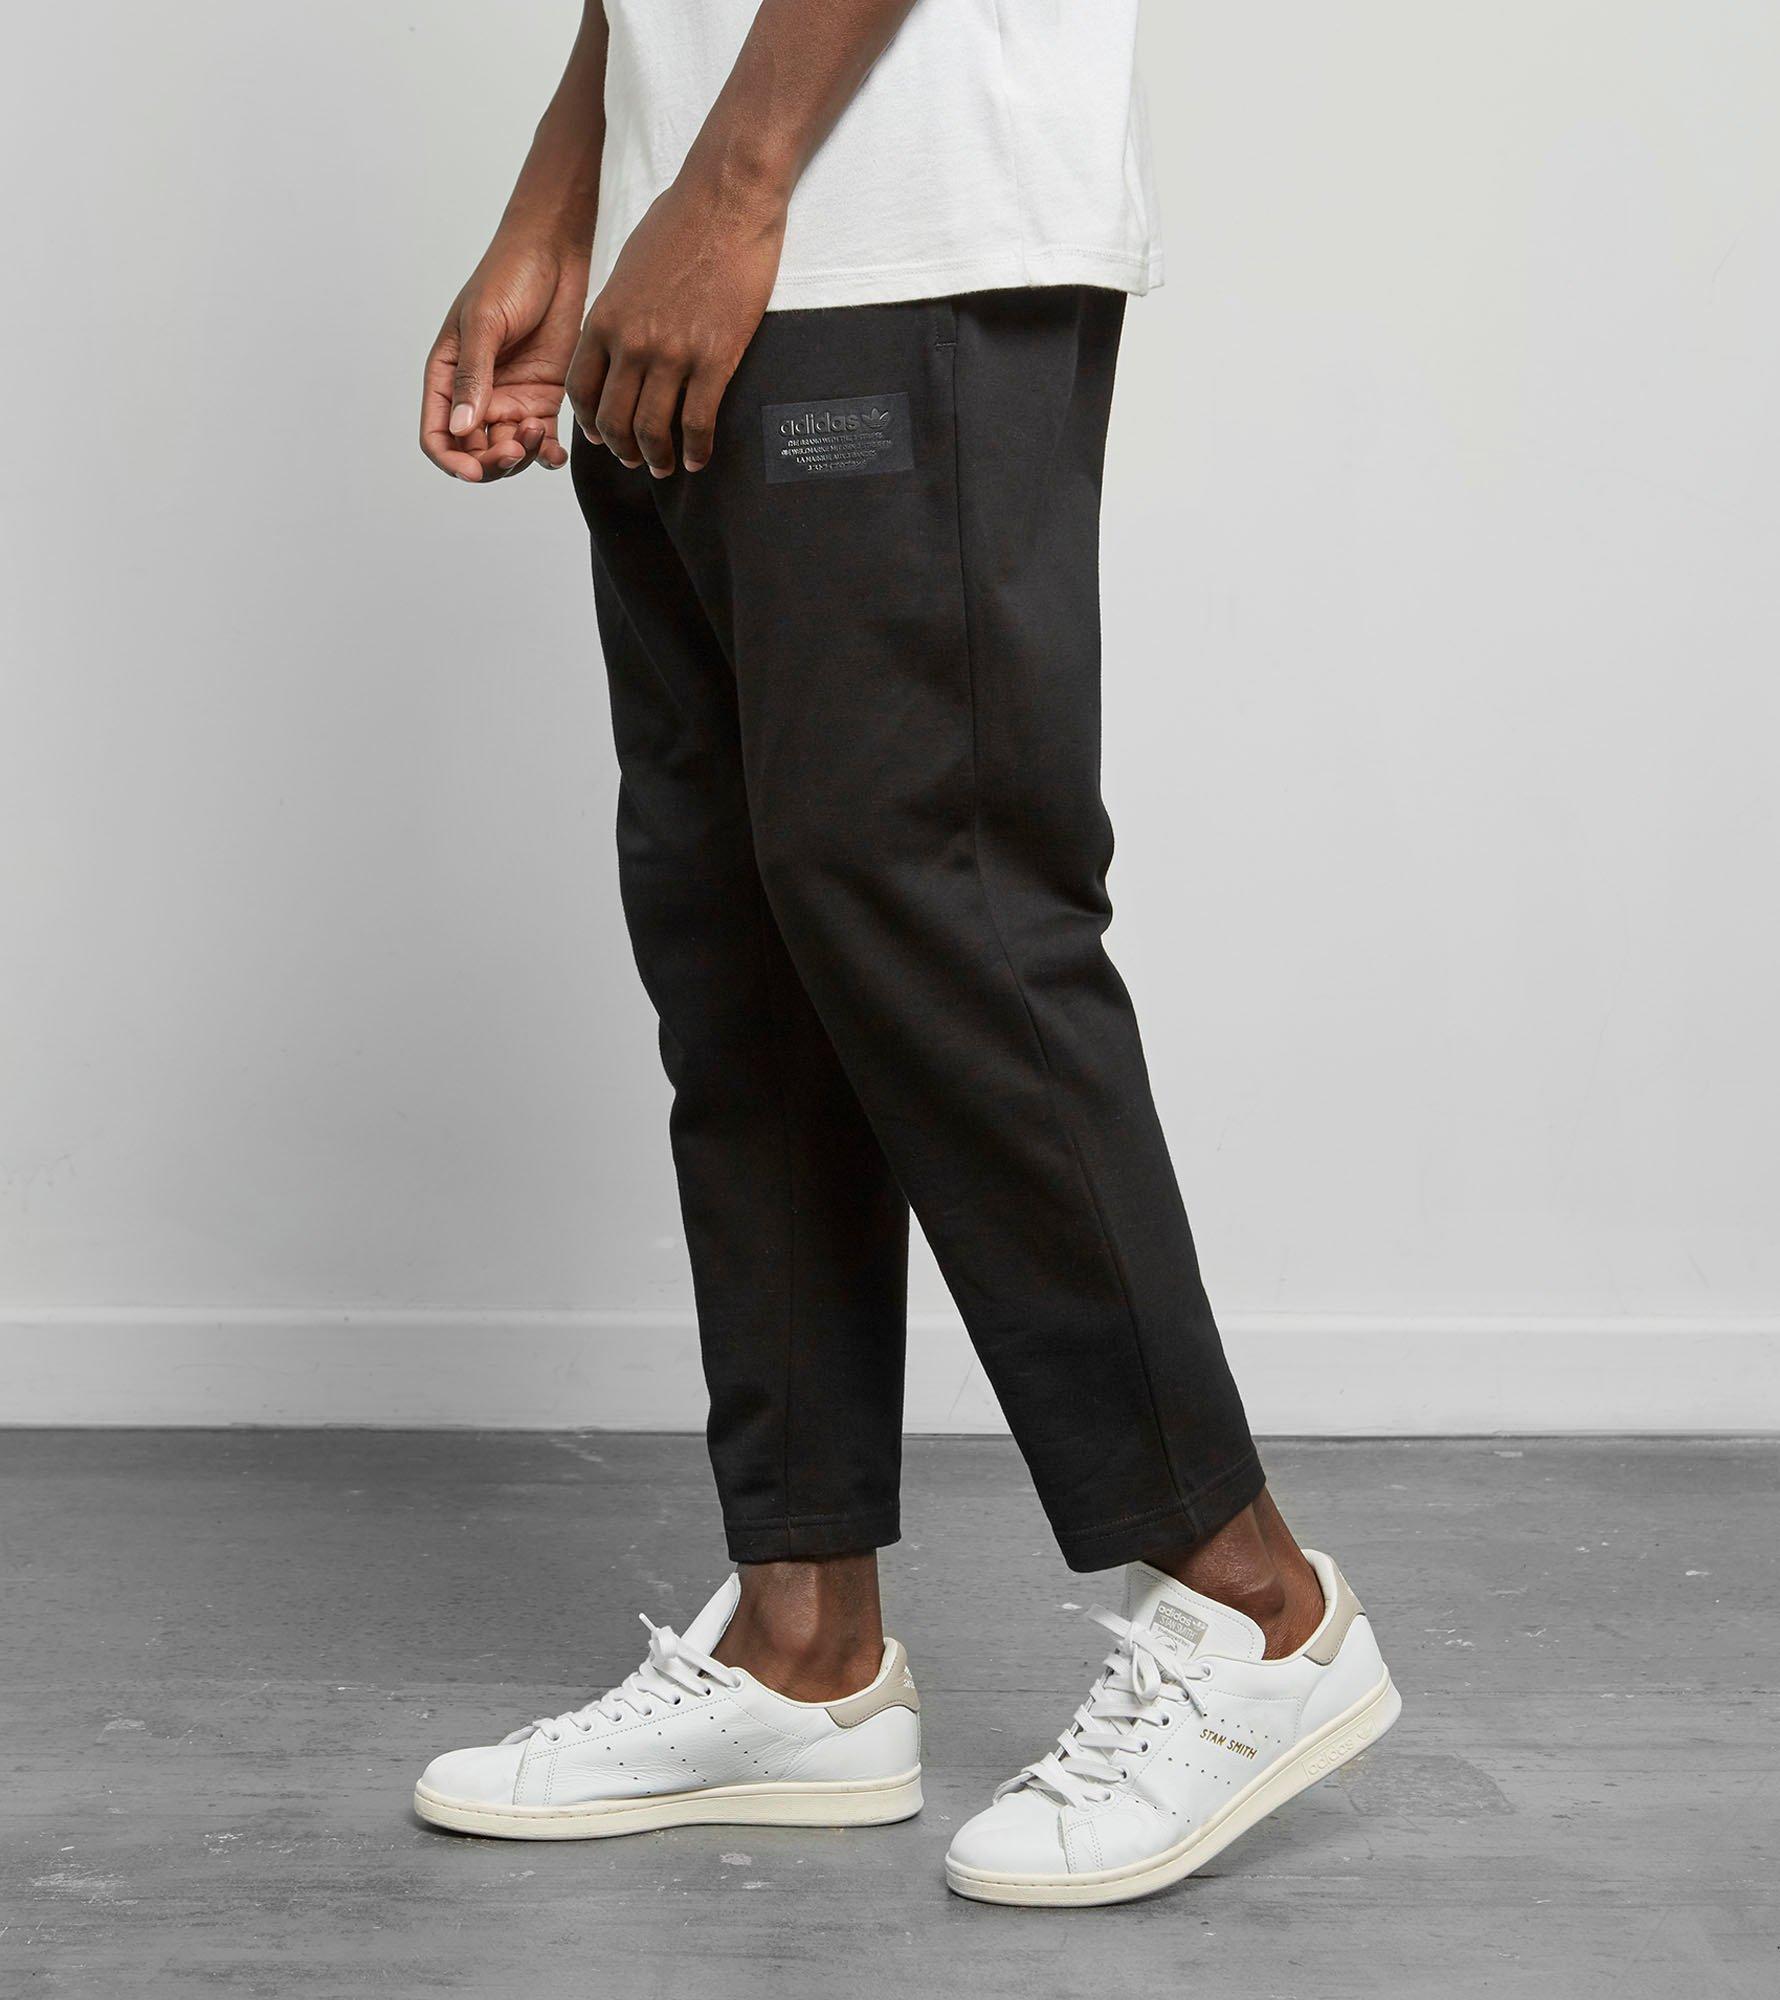 a5fe73cb945eb Lyst - adidas Originals Nmd Sweatpants in Black for Men